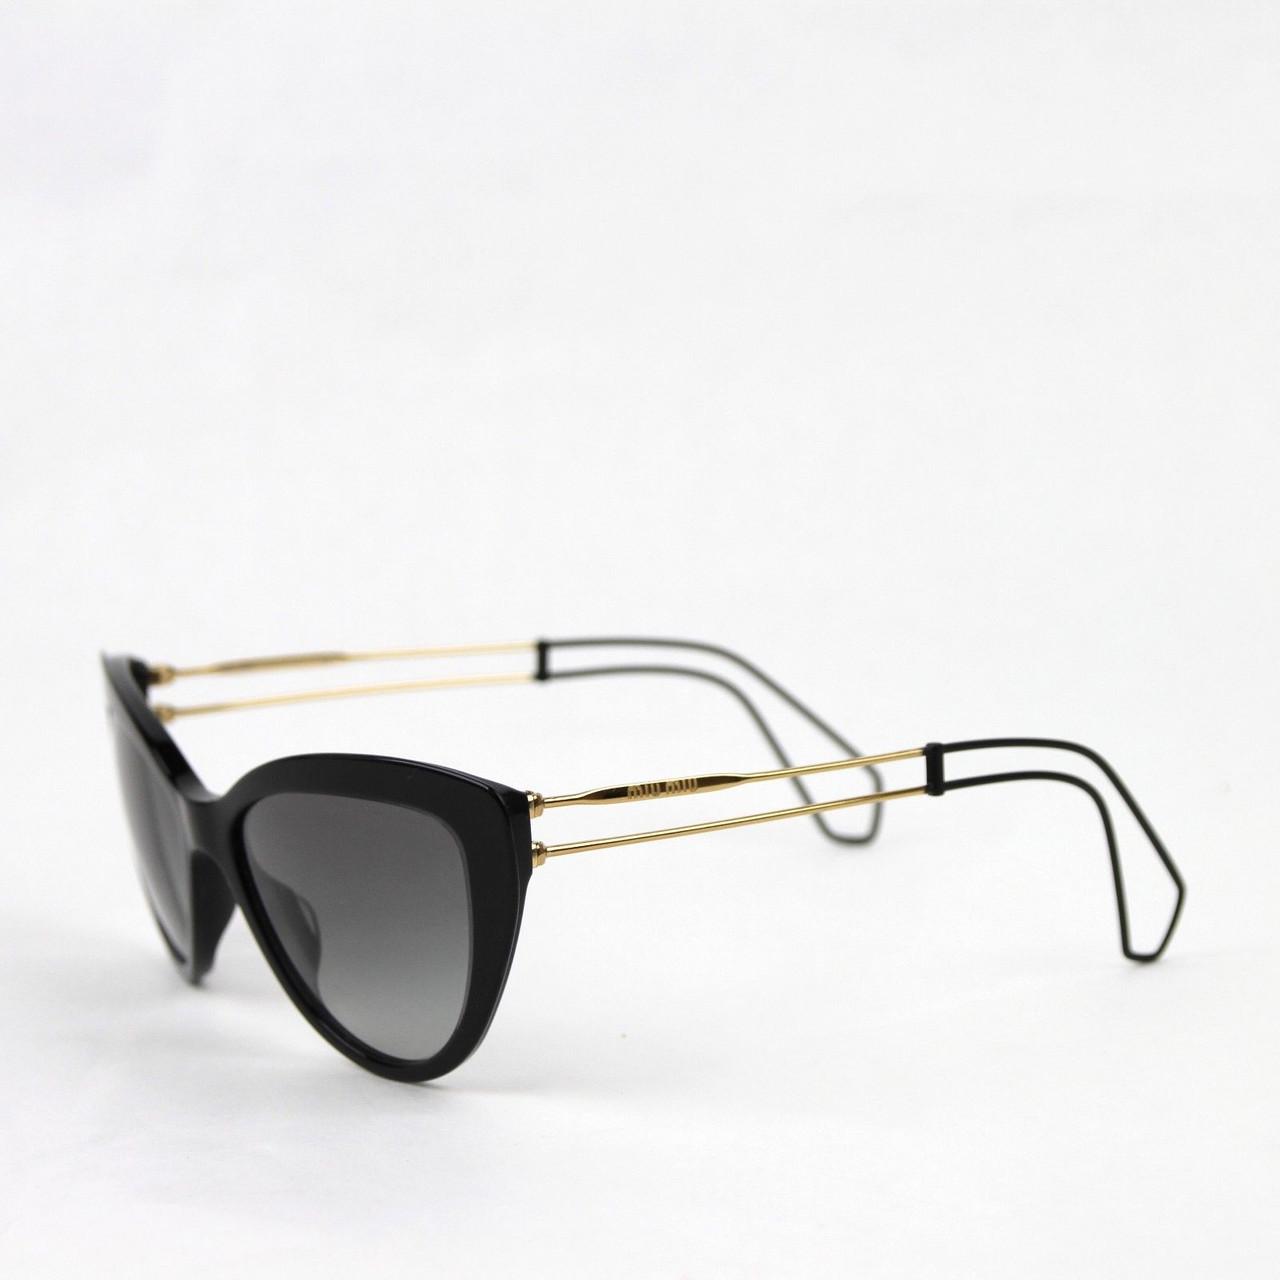 Miu Miu Cat Eye Blackgray Transparent Sunglasses 12r U6f 3m1